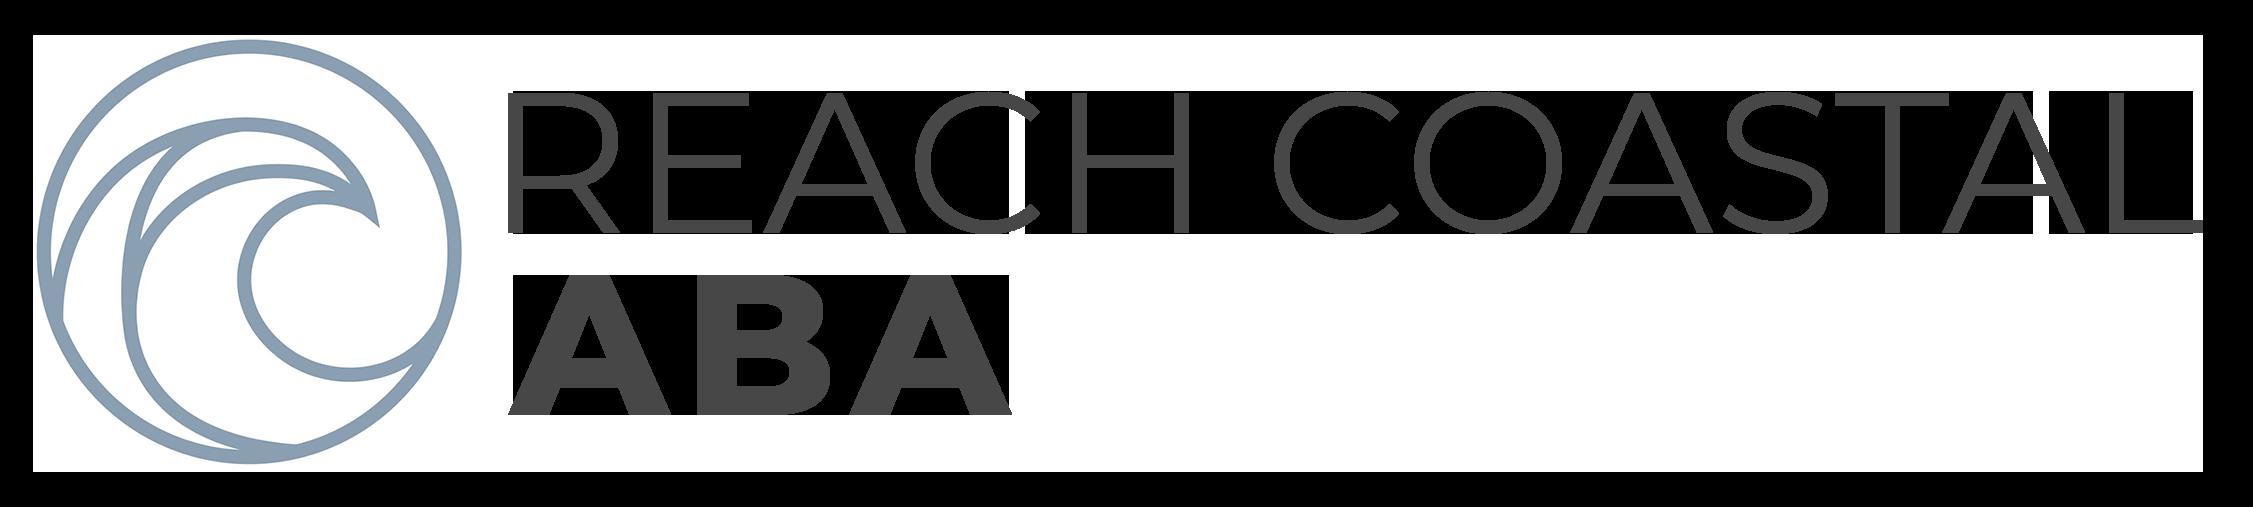 reachcoastalabalogo